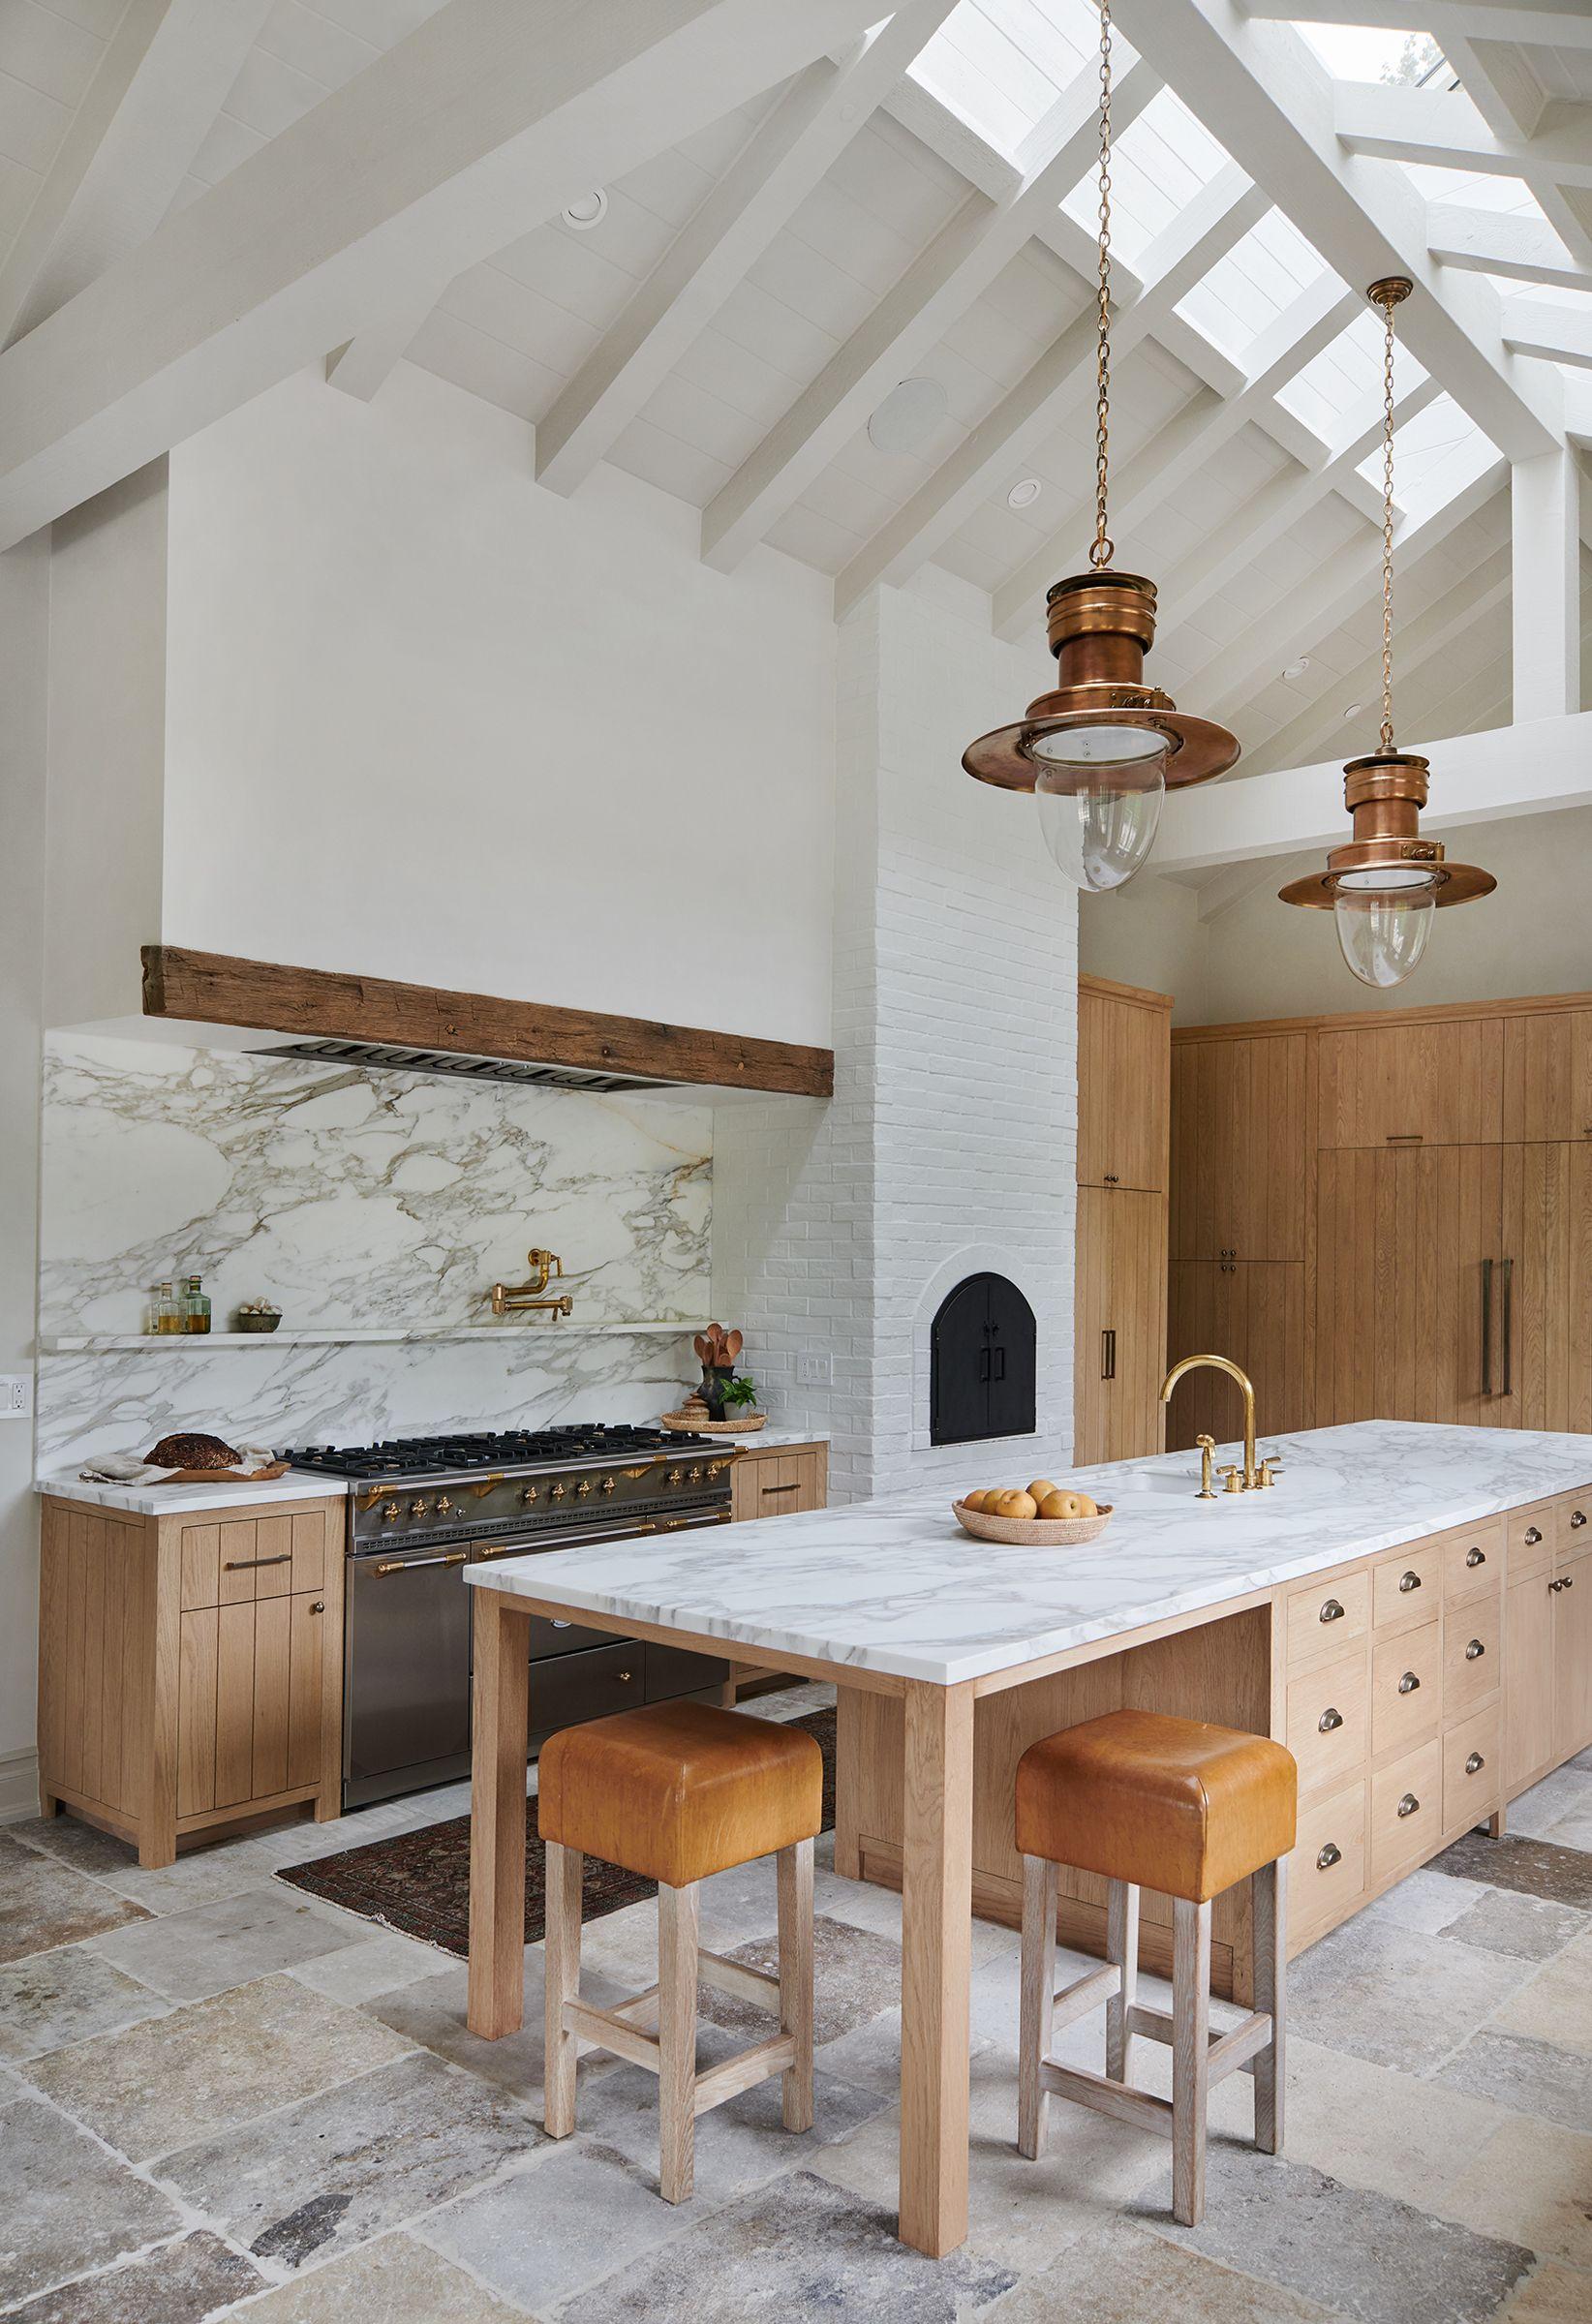 Amber-Interiors-Client-Bu-Round-Two-Tessa-Neustadt-5-2a.jpg